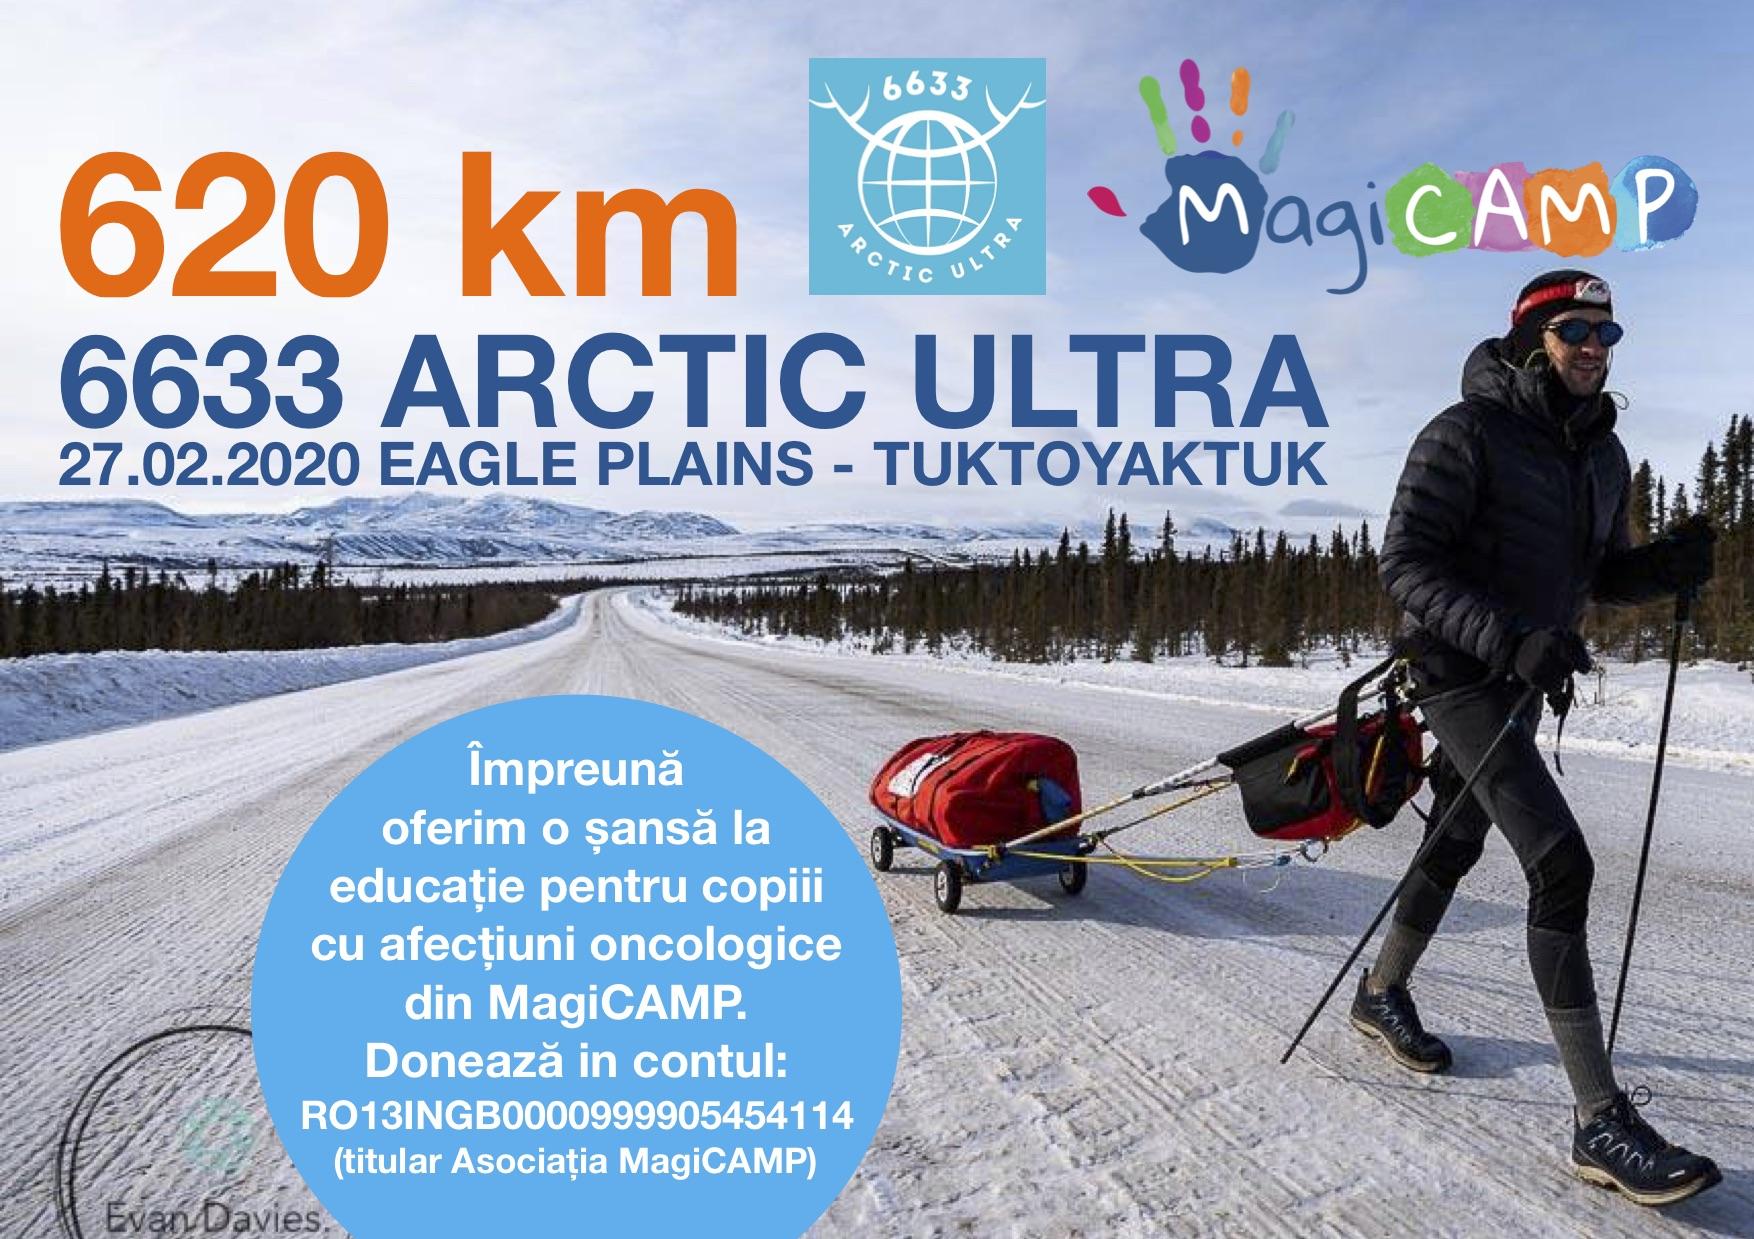 poster 620 km 6633 Arctic Ultra 2020